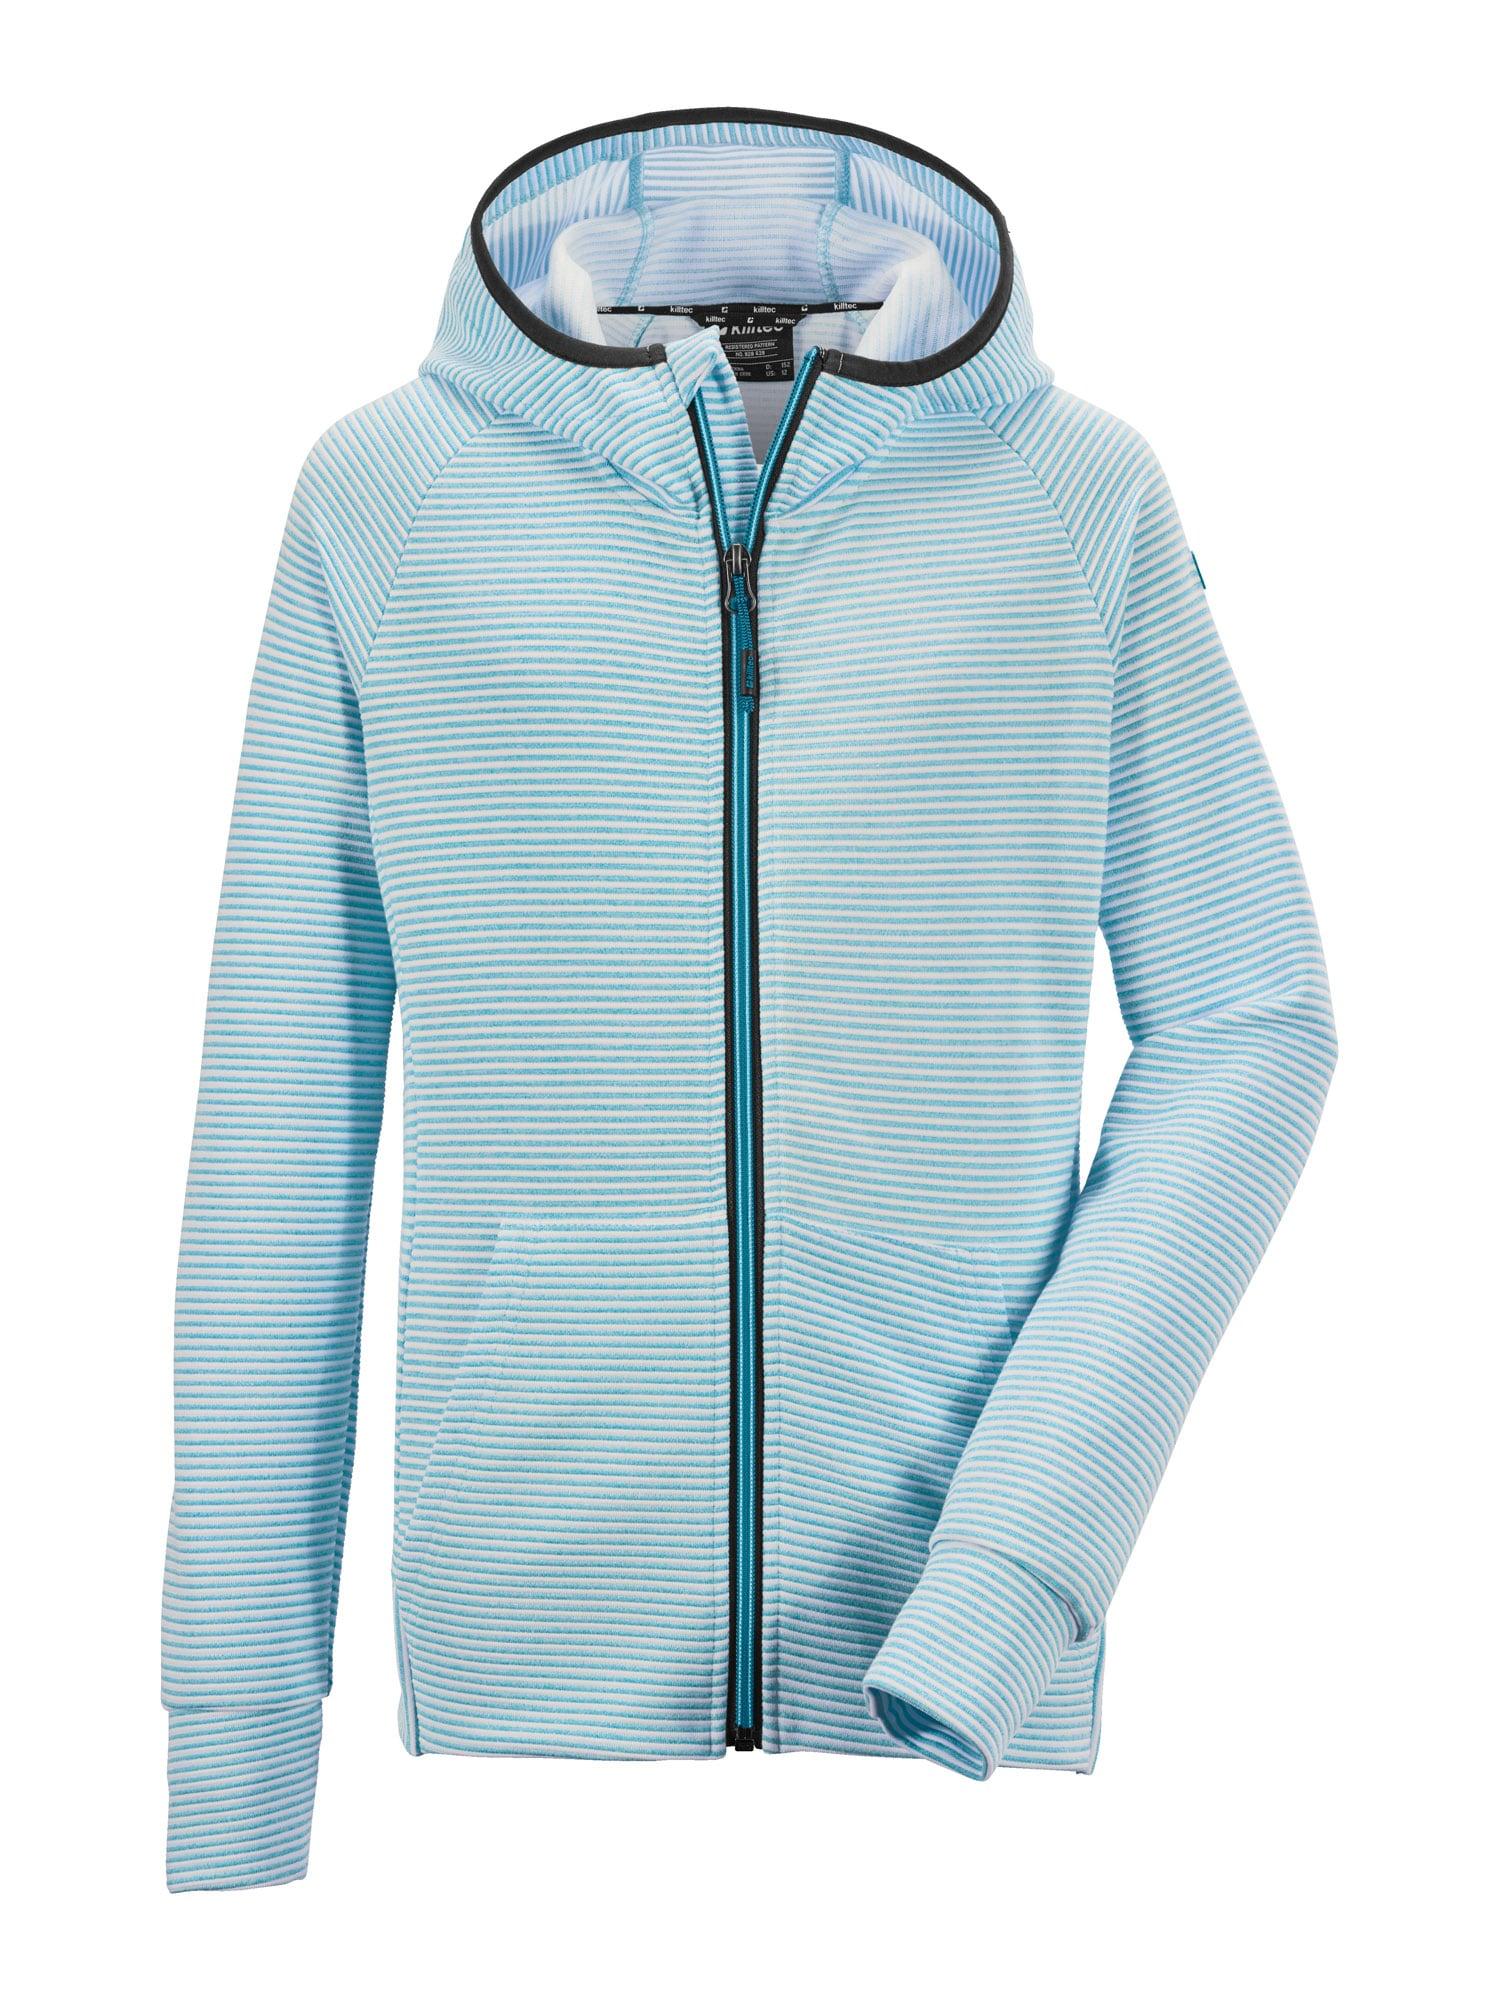 KILLTEC Sportinis džemperis 'Rodeny' turkio spalva / balta